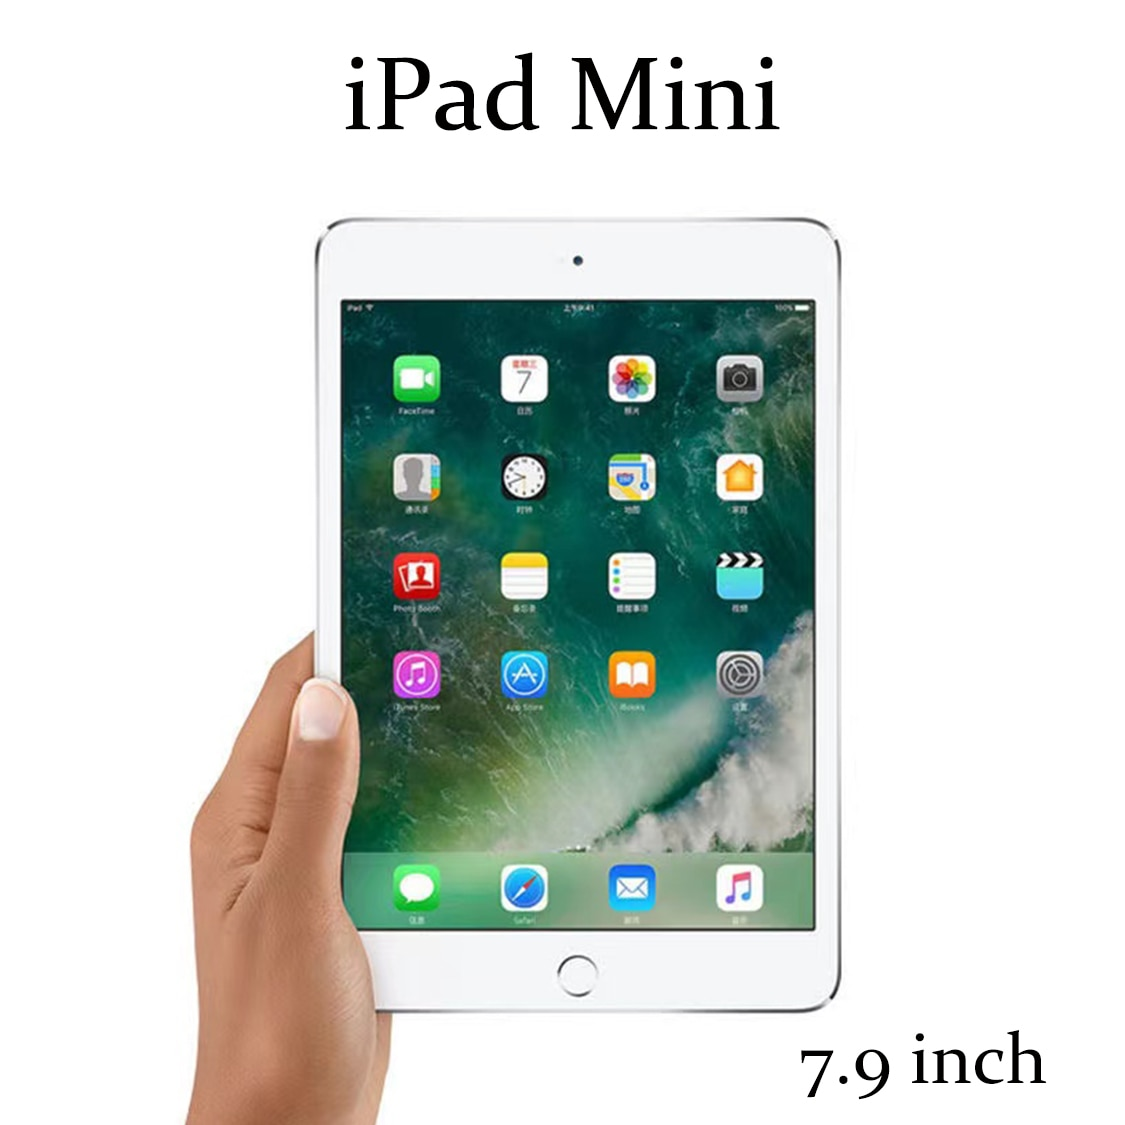 Original usado apple ipad mini 1st/2nd/5th 7.9 polegada 2012 90% novo 16/32/64gb preto prata ios tablet wifi versão duplo-core a5 5mp